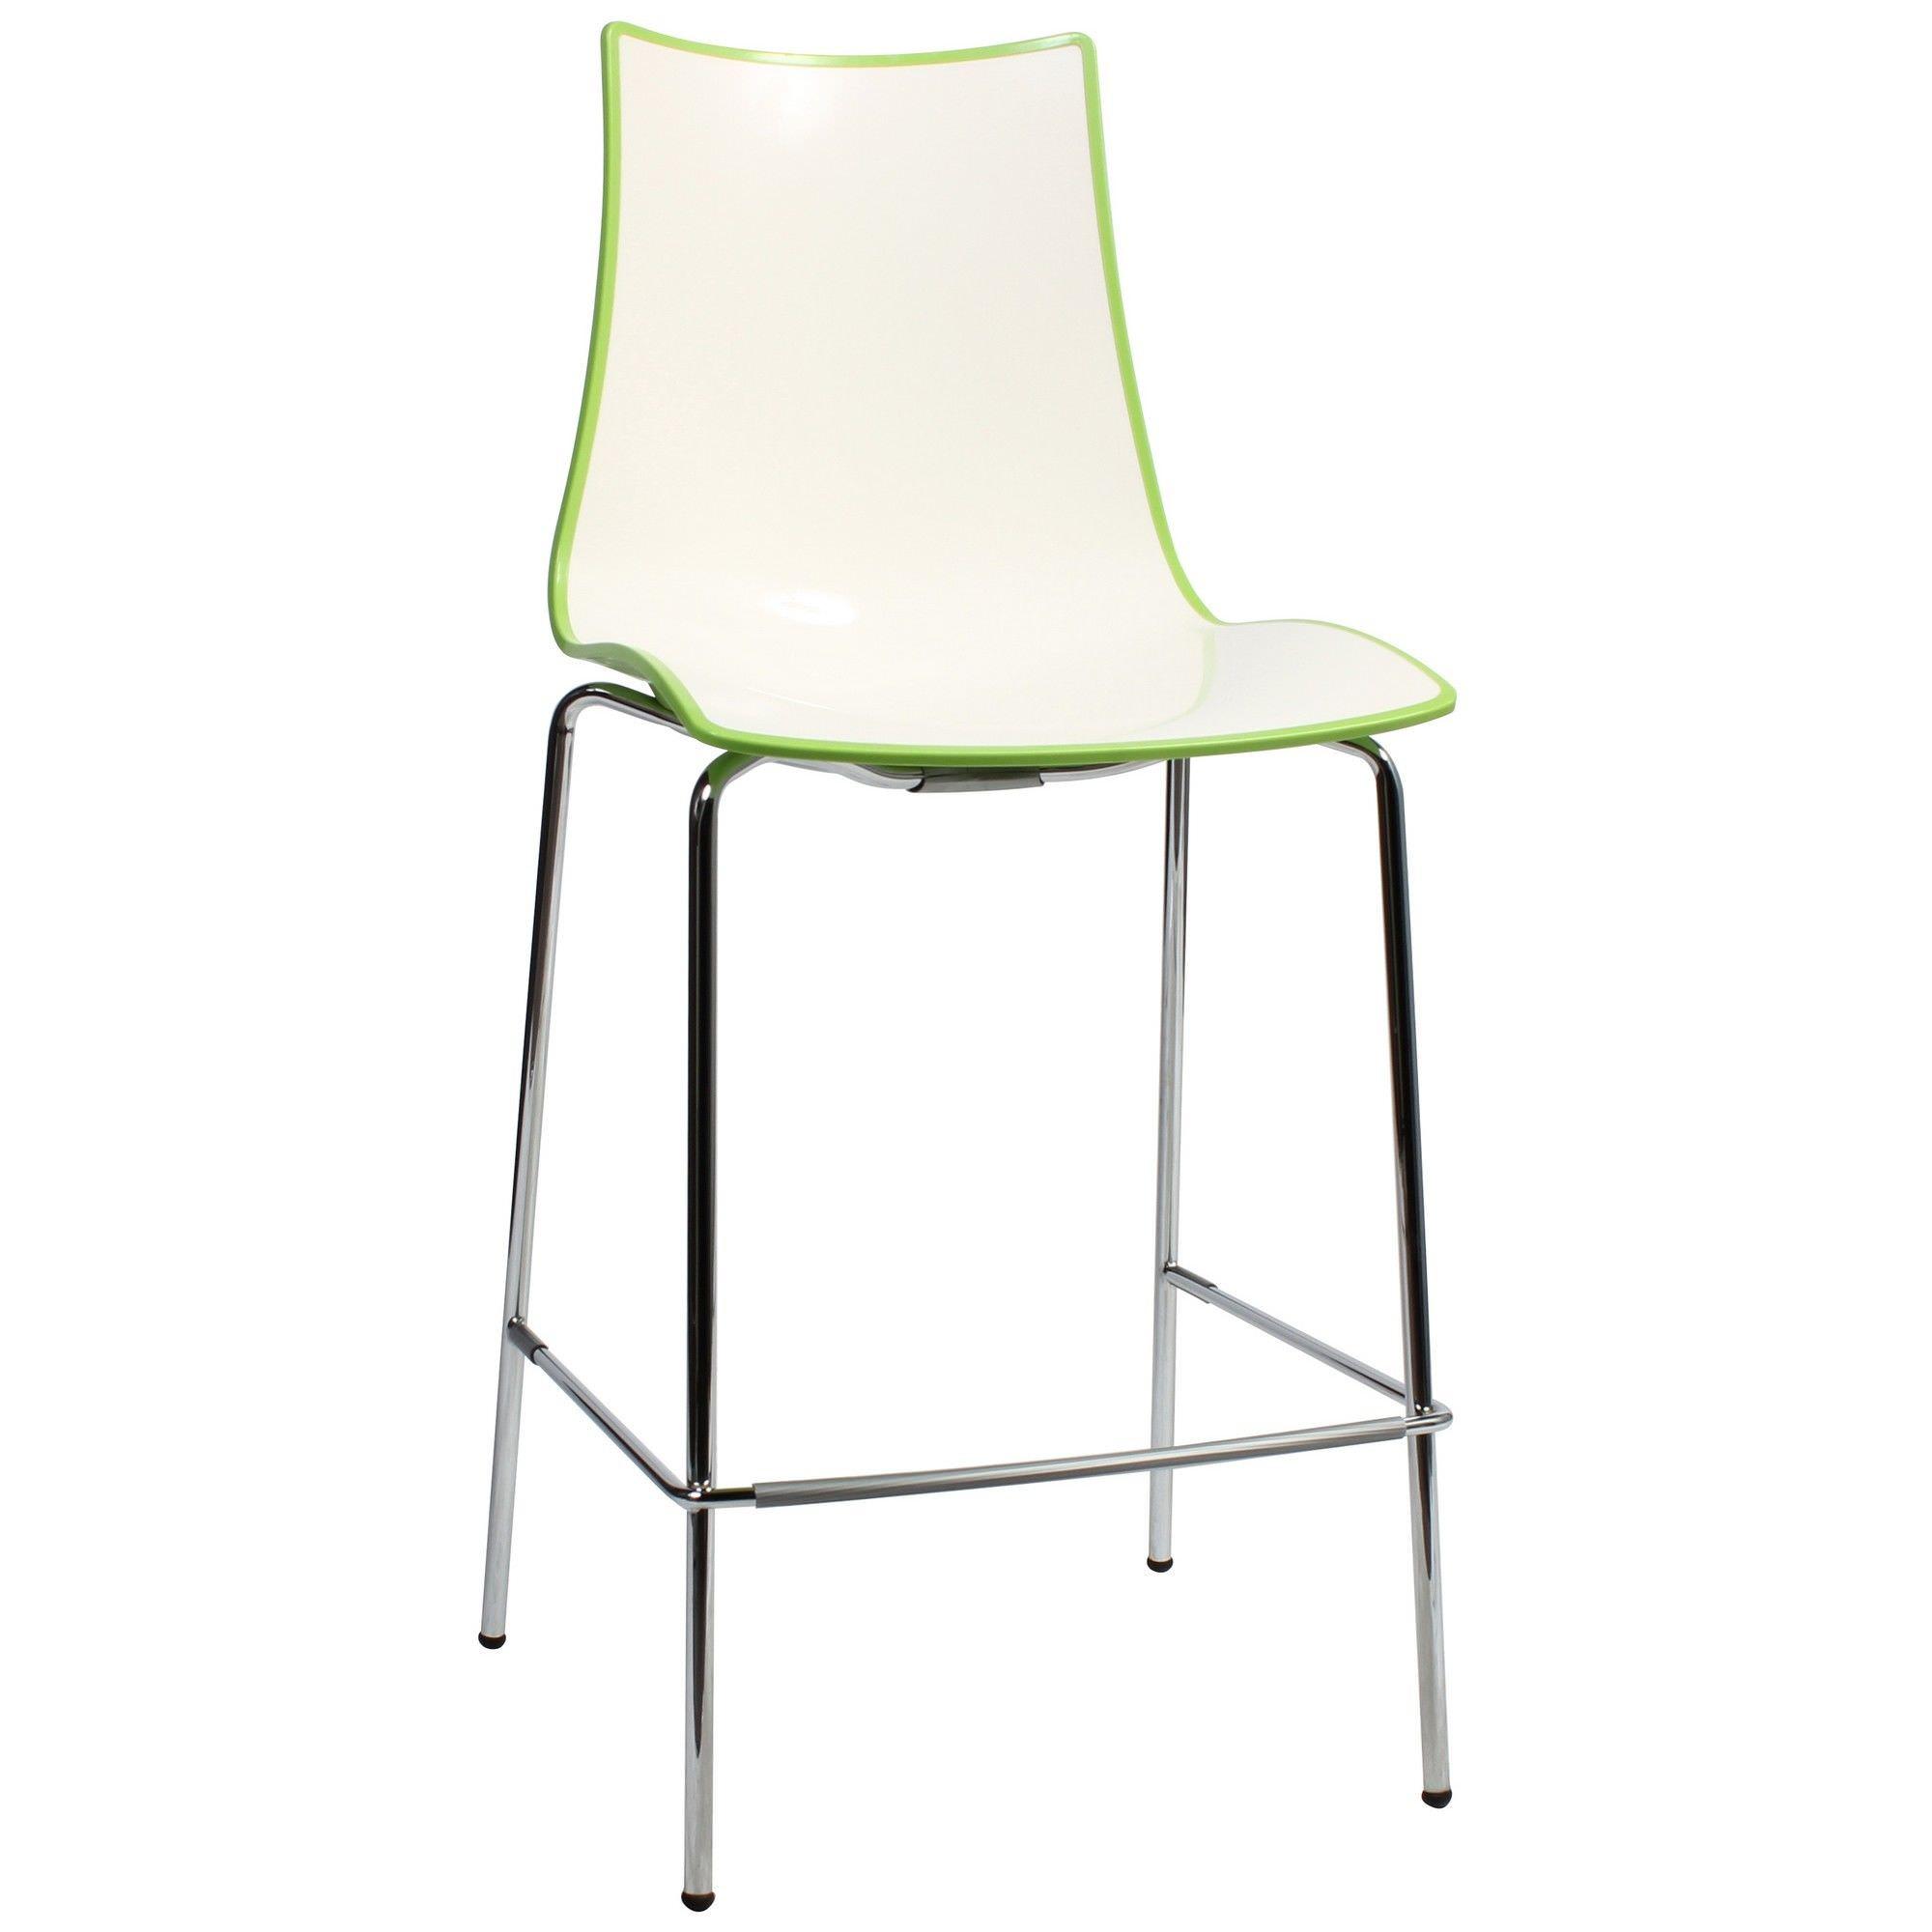 Zebra Bicolore Italian Made Commercial Grade Counter Stool, Metal Leg, Green / Chrome